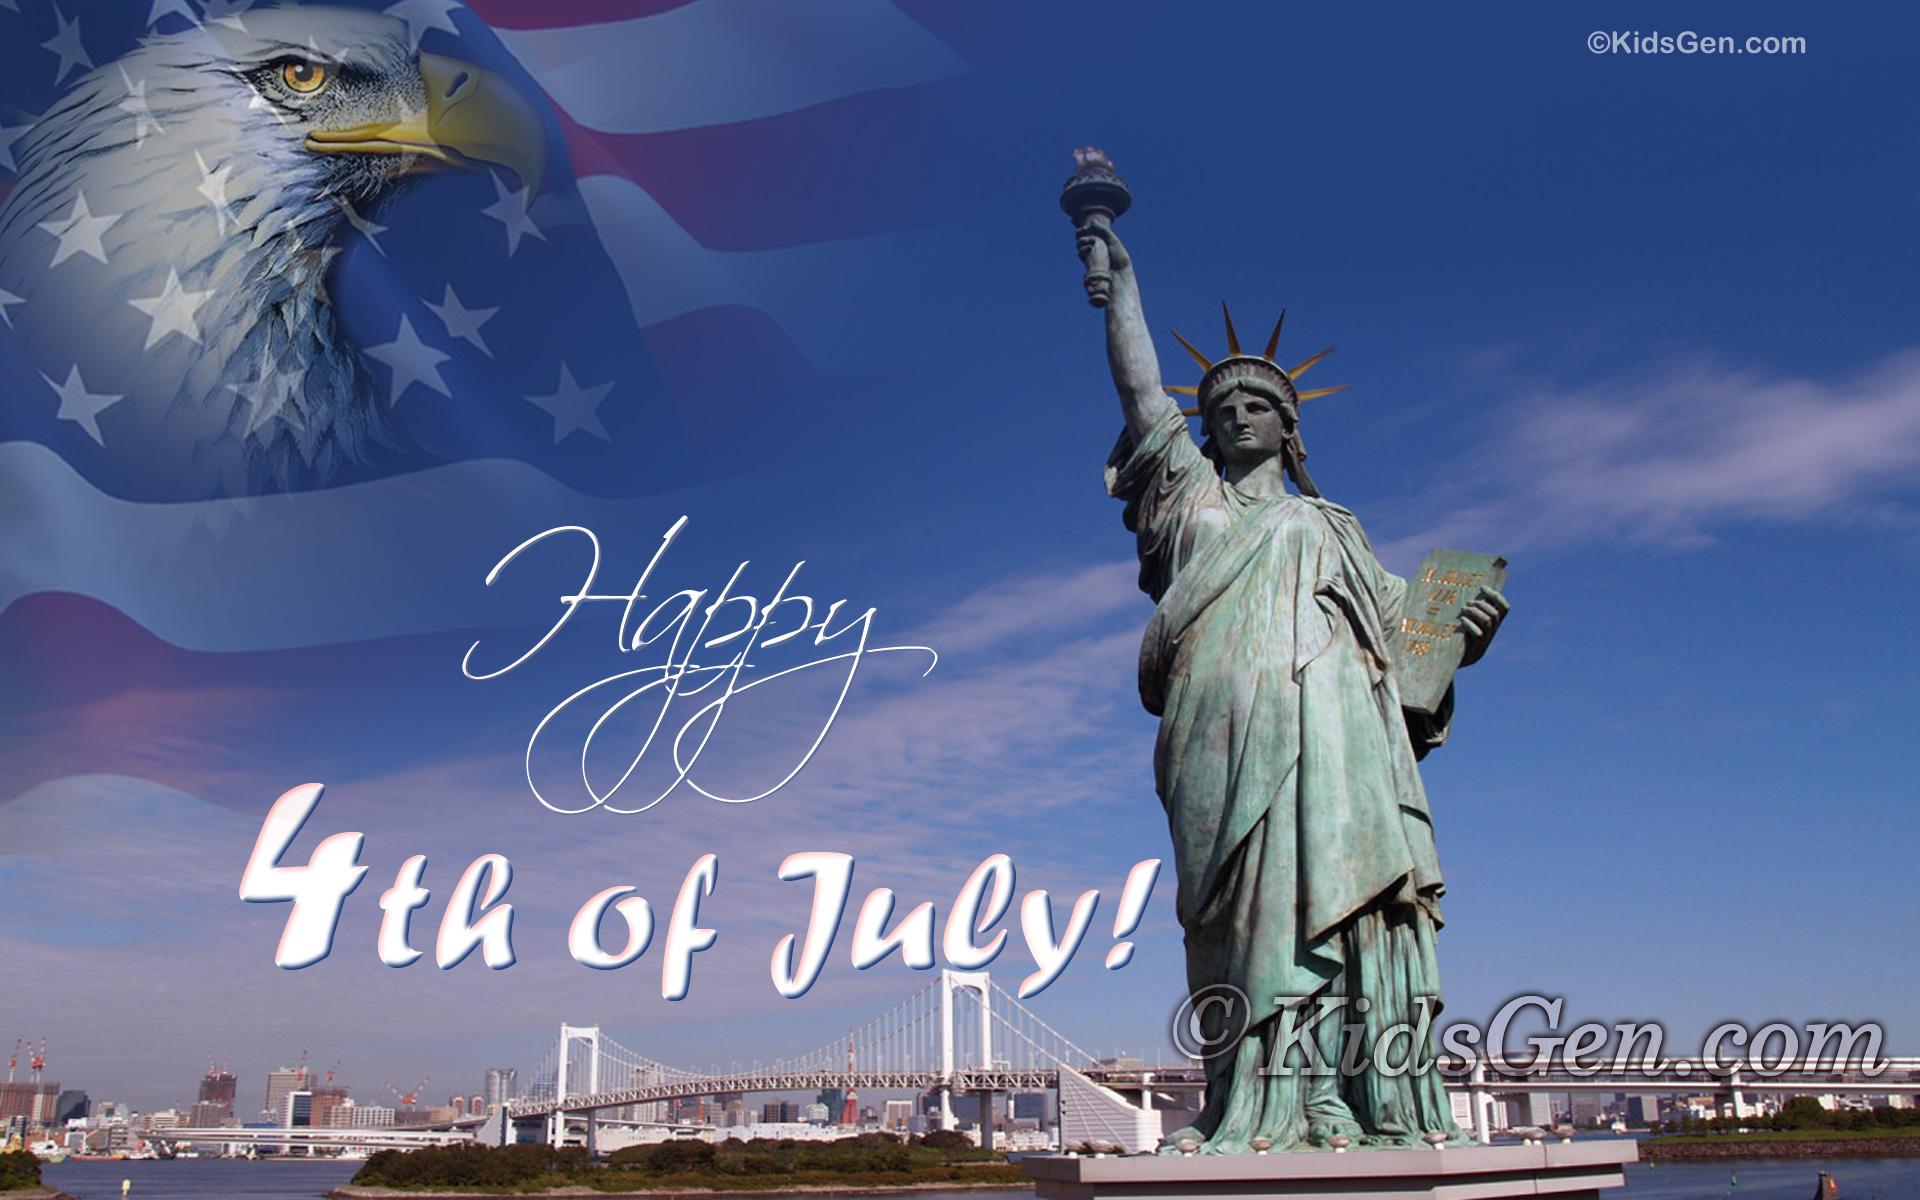 Stranger in a Strange Land: Happy Fourth Of July 2014